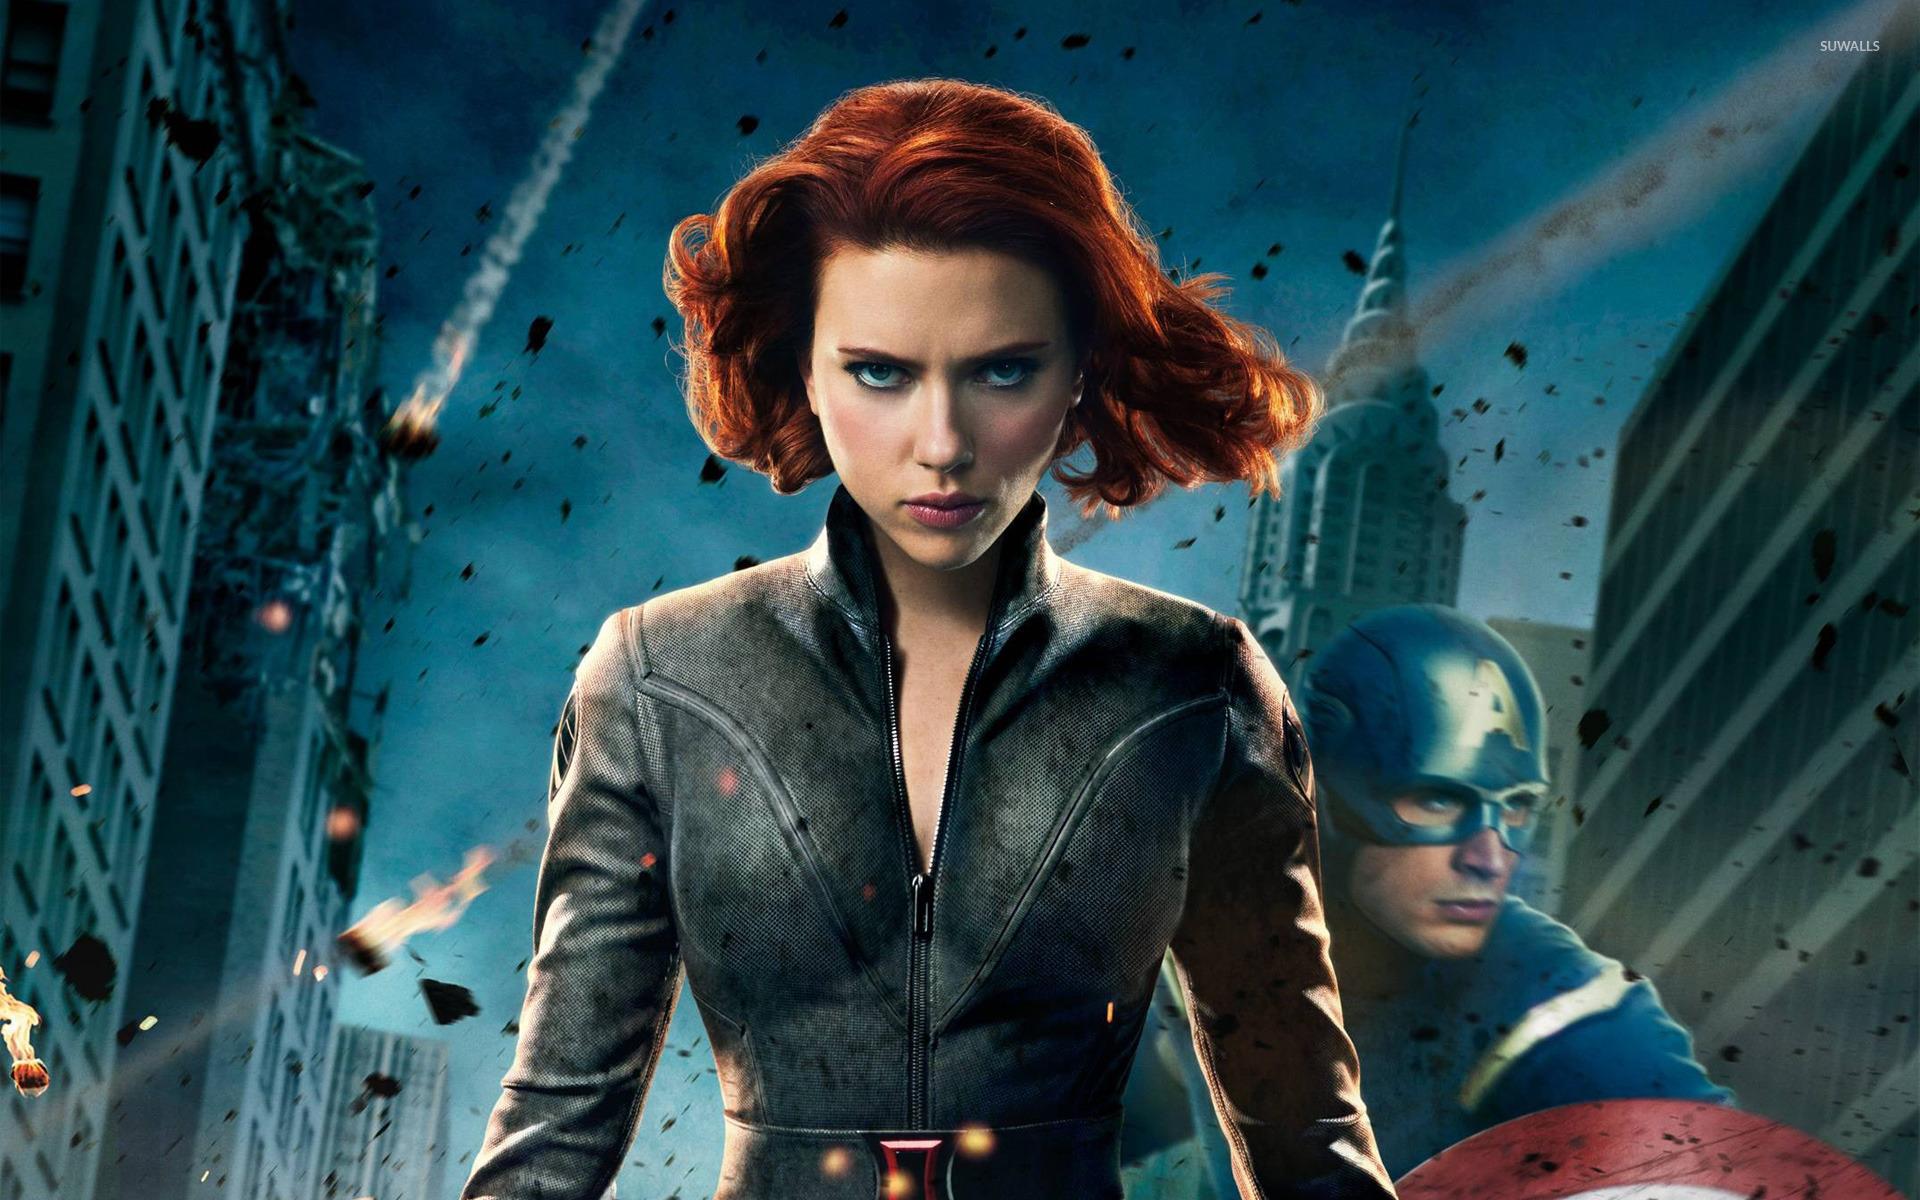 Black Widow - The Avengers [2] wallpaper - Movie wallpapers